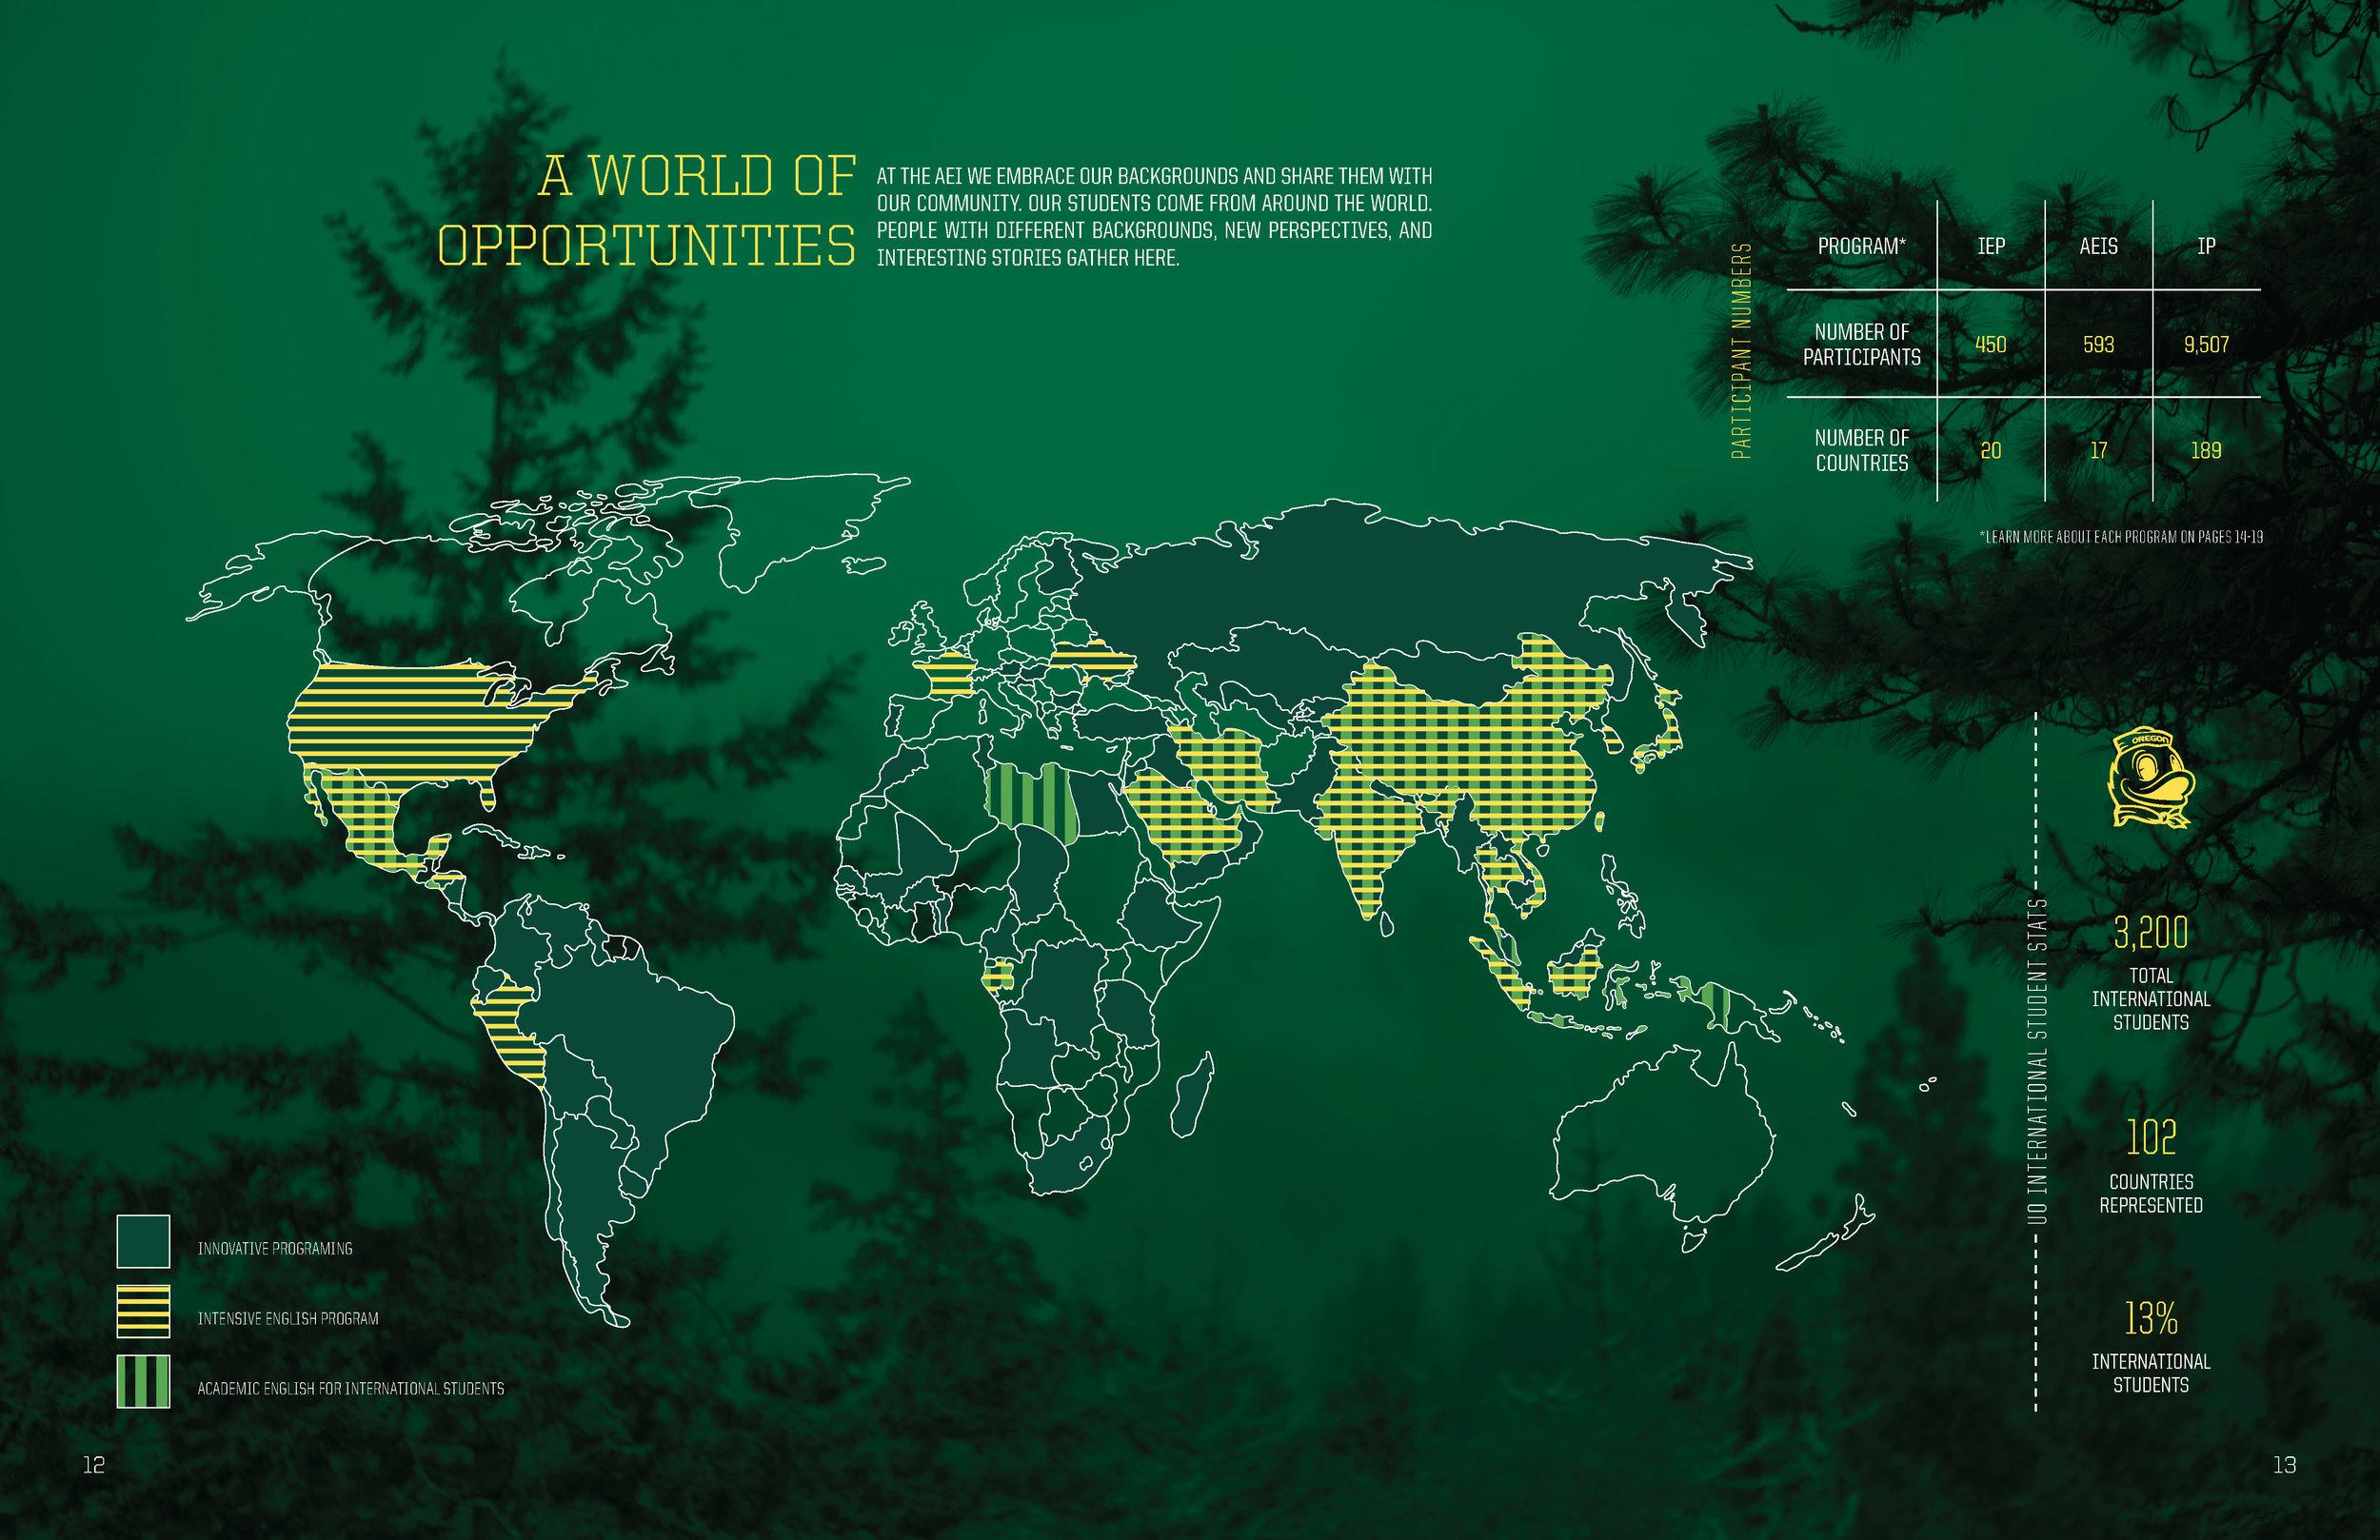 AEI Annual Report spreads_Page_07.jpg